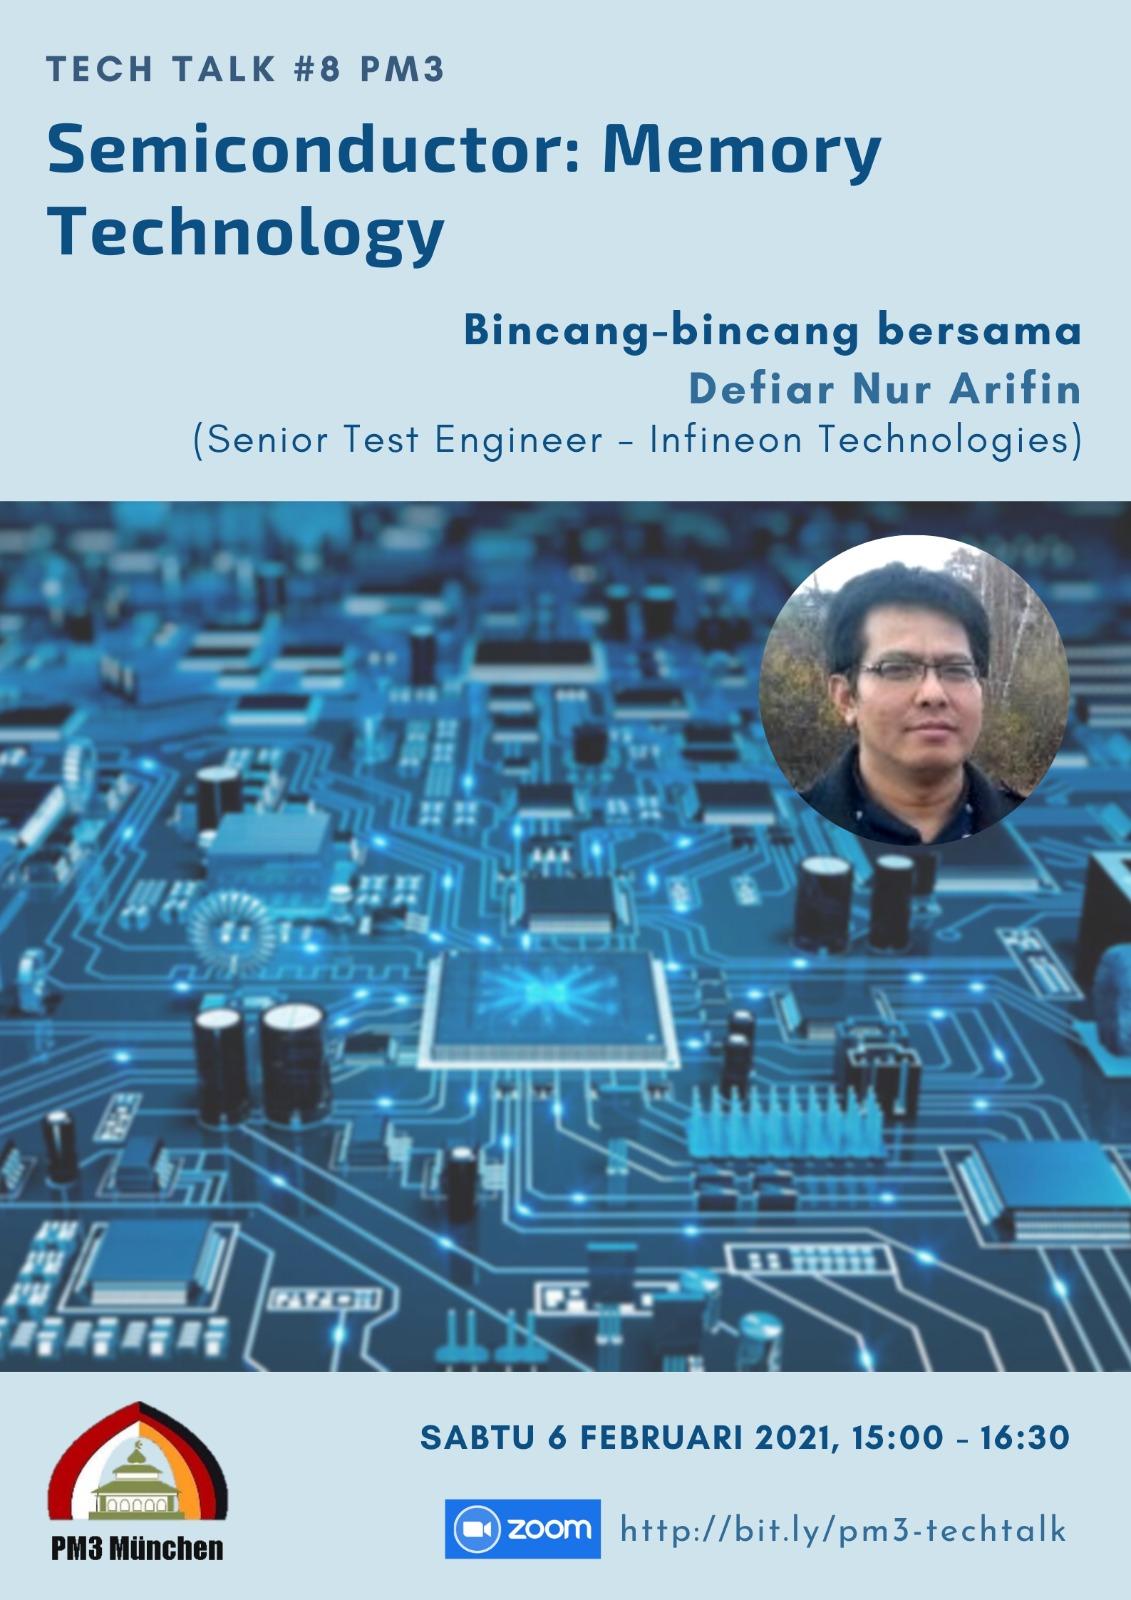 Tech Talk #8 - Semiconductor: Memory Technology